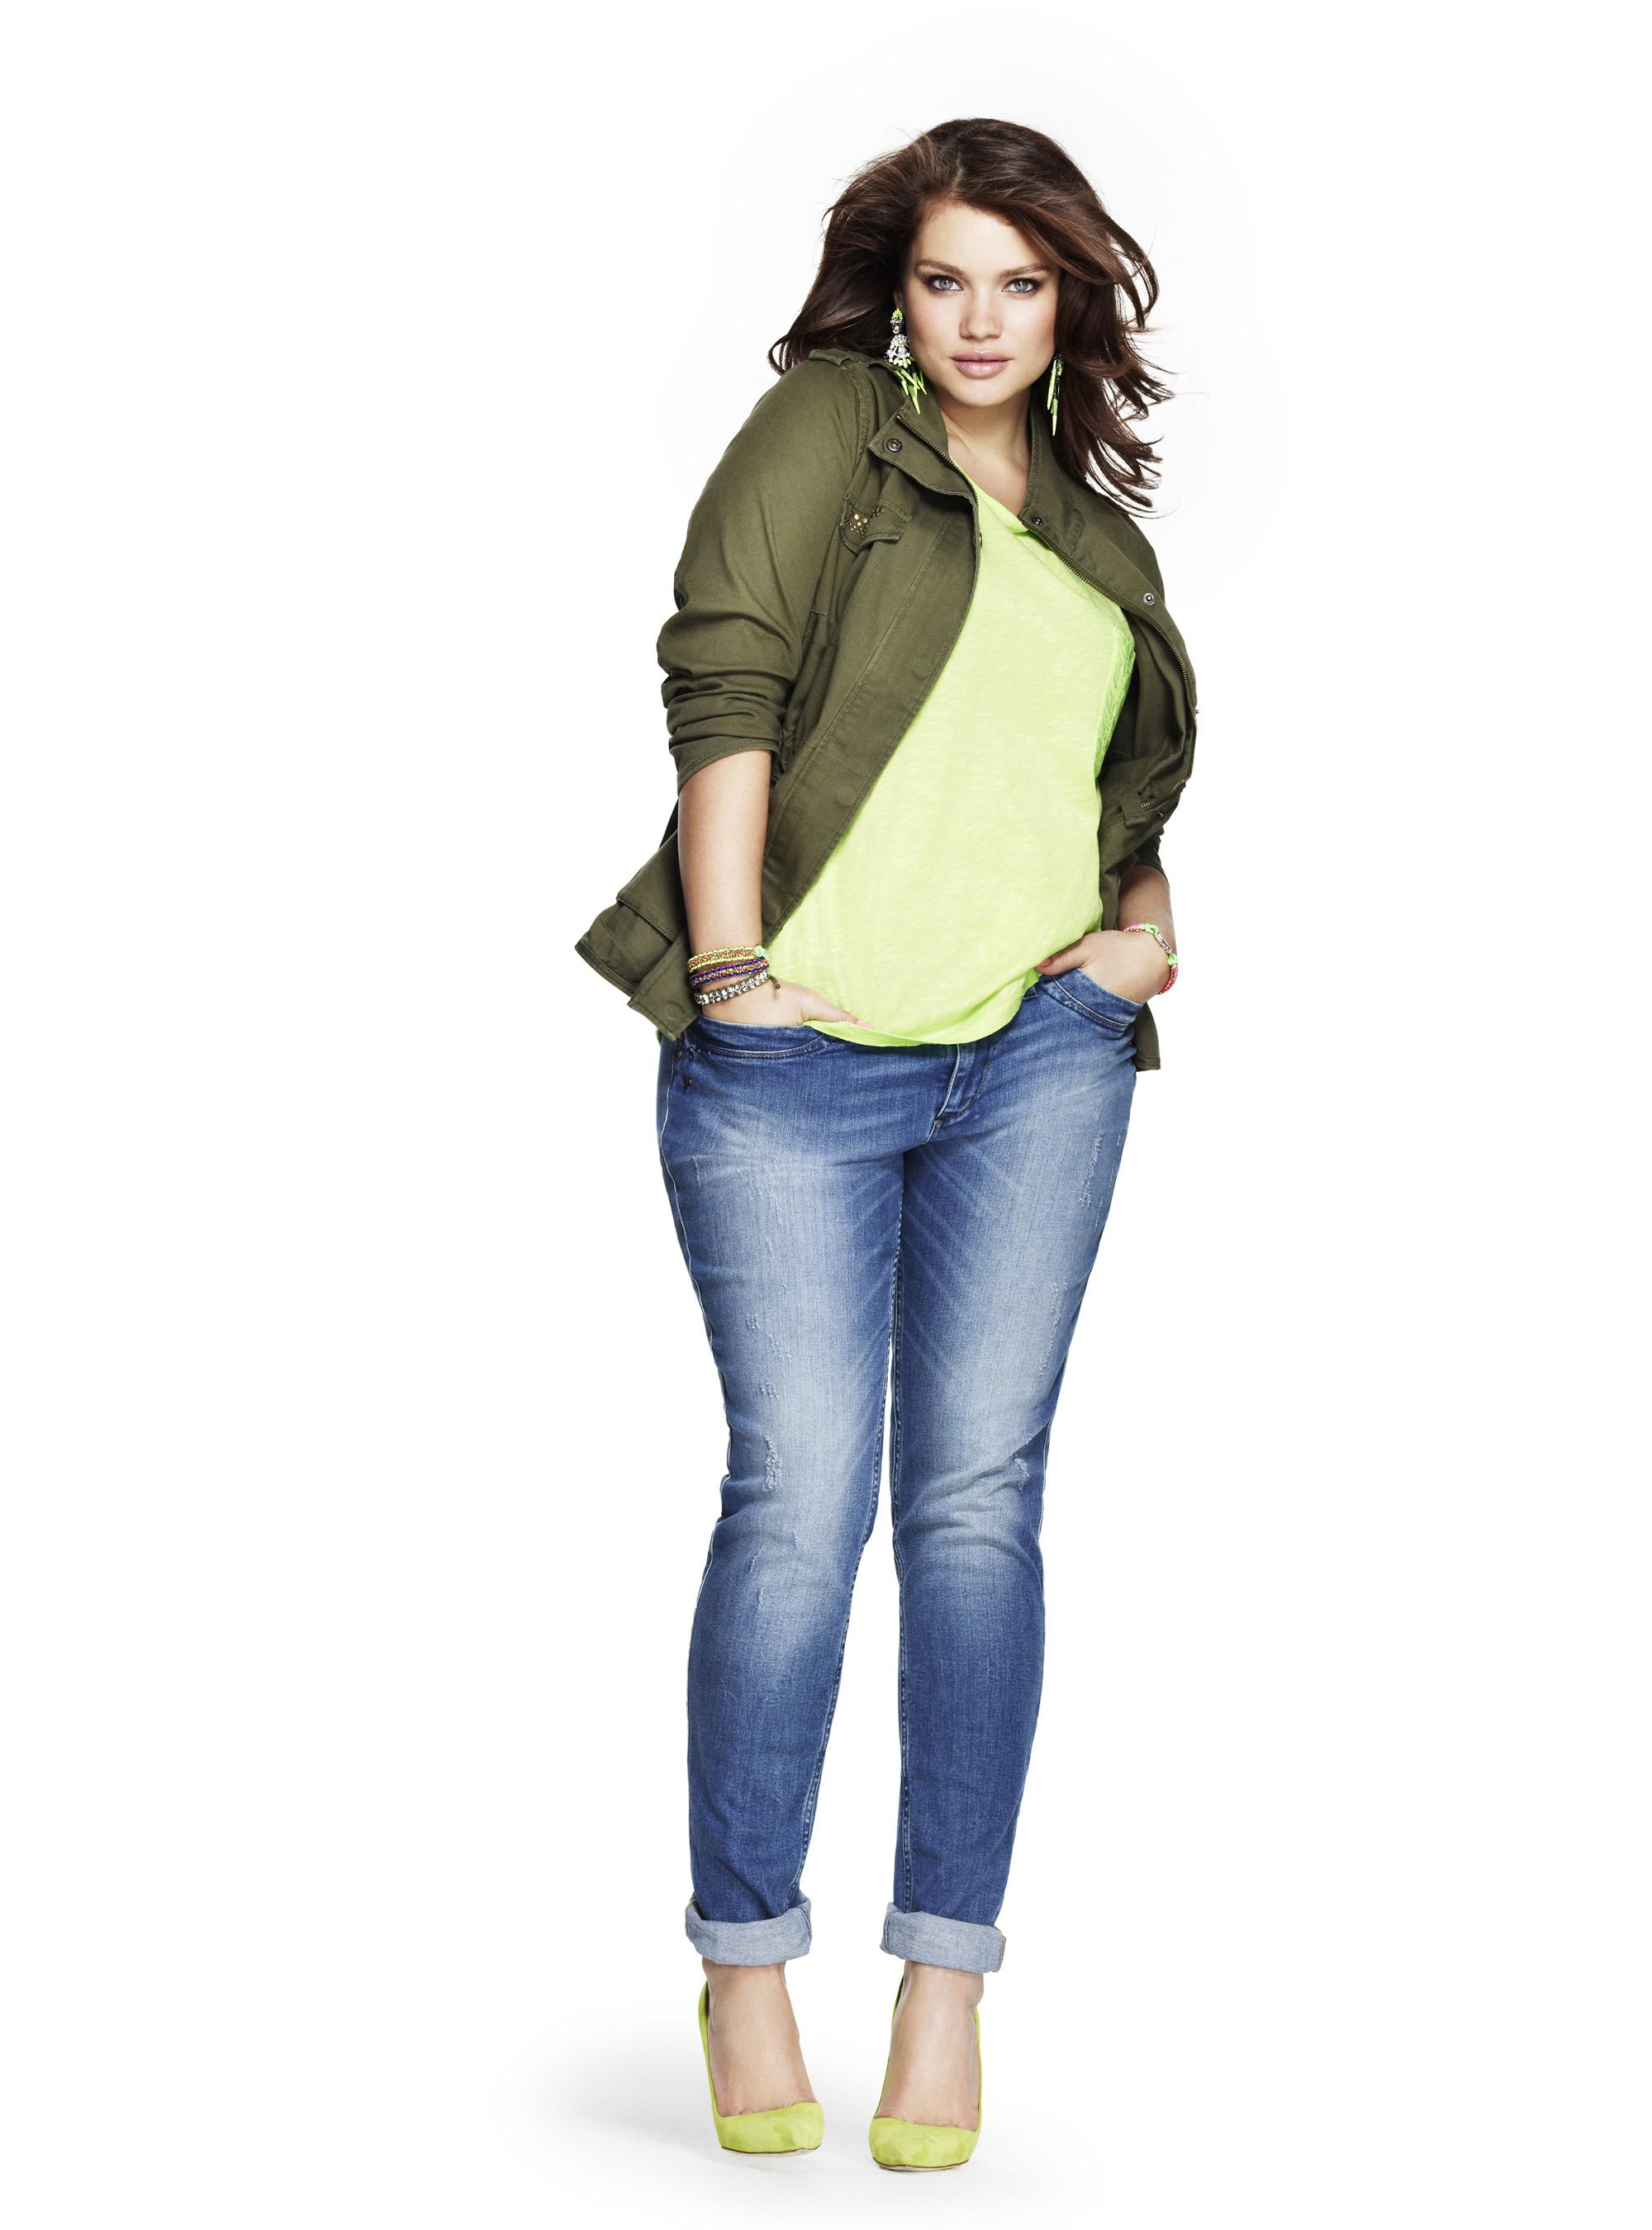 Толстушки в джинсах фото 19 фотография